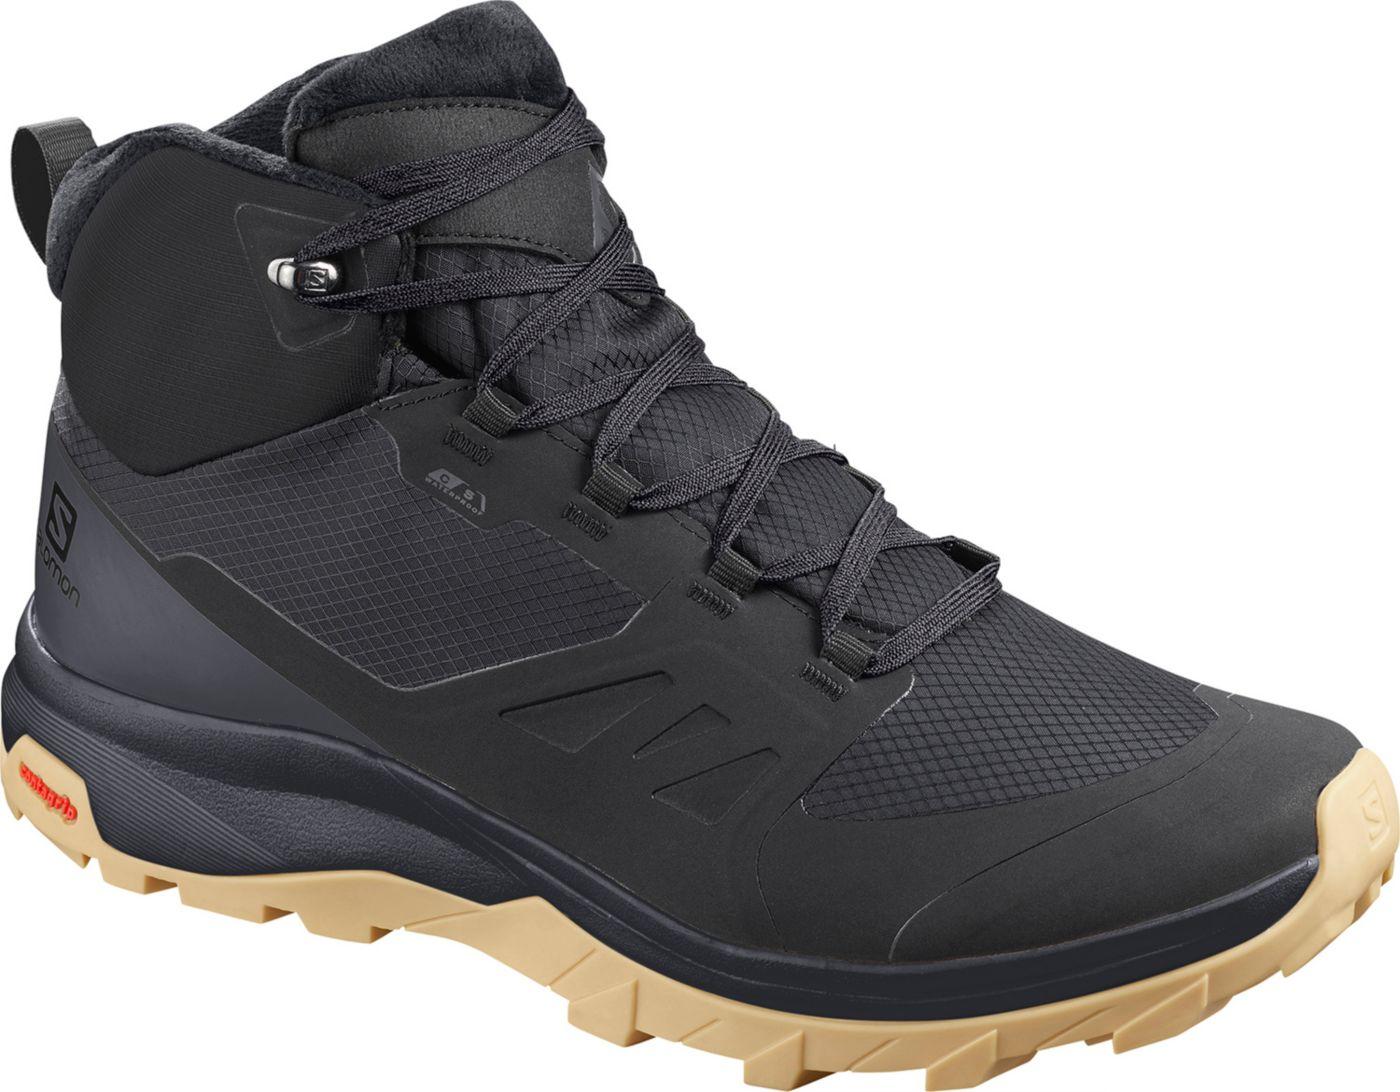 Salomon Men's OUTSnap Waterproof Hiking Boots